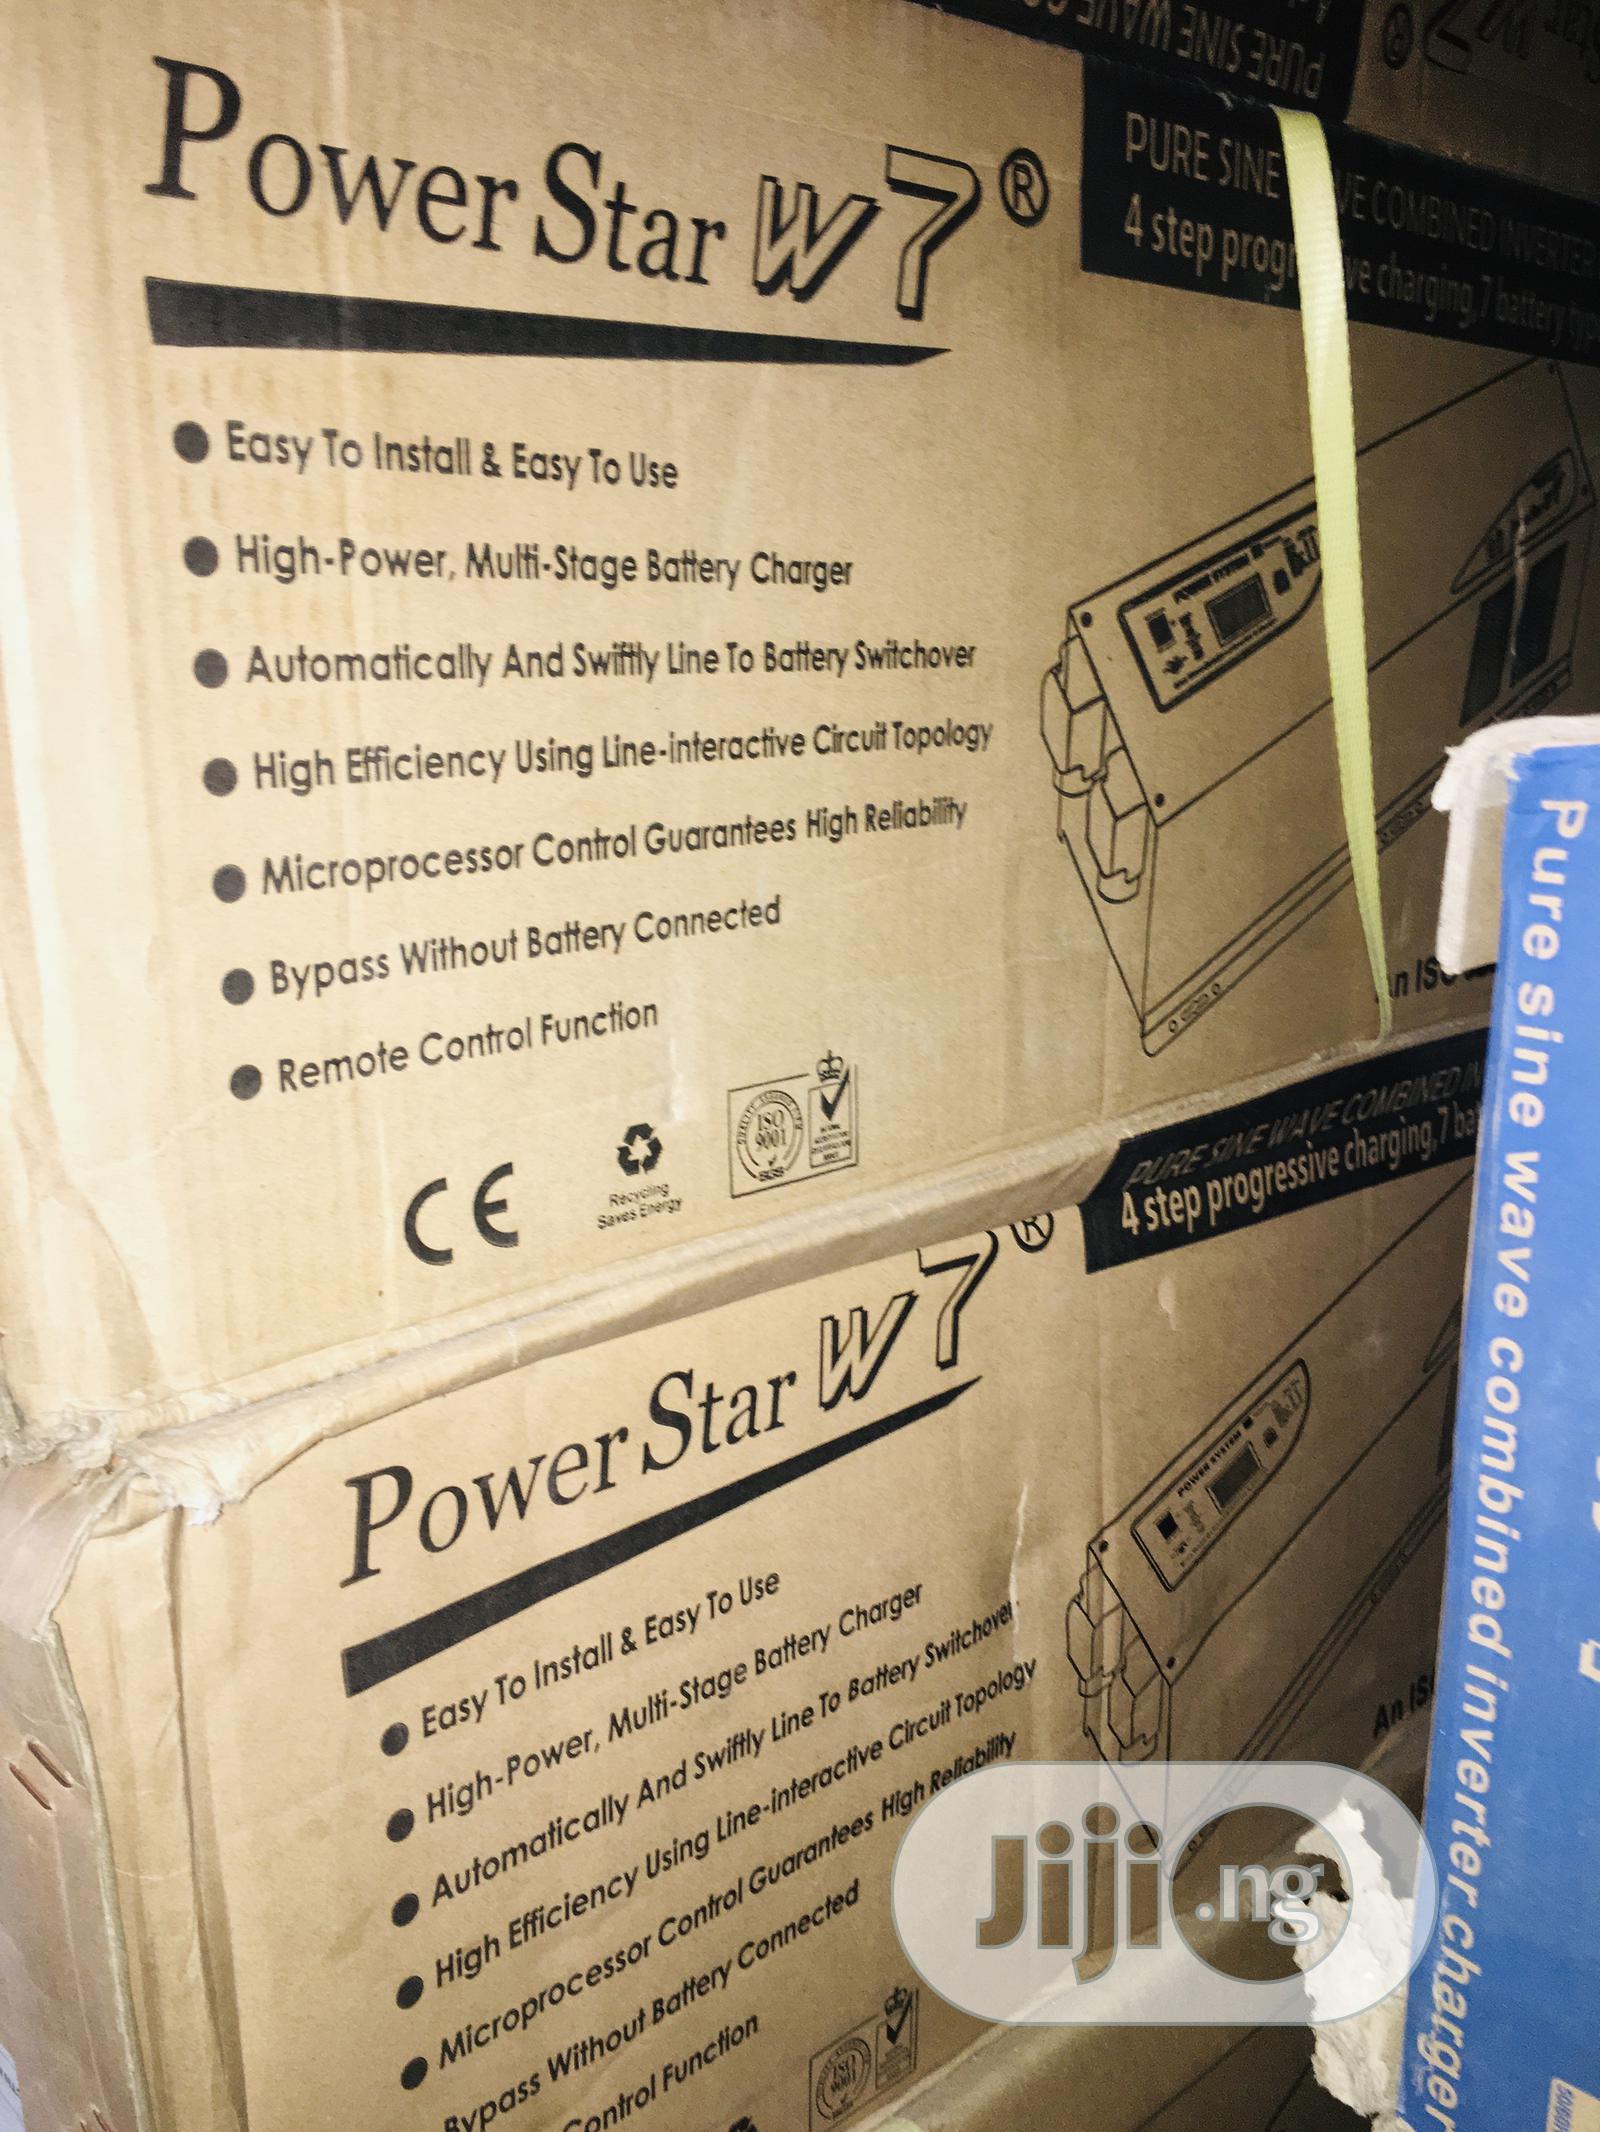 5kva 24v Power Star Pure Sine Wave Inverter Available With 1yrwaranty